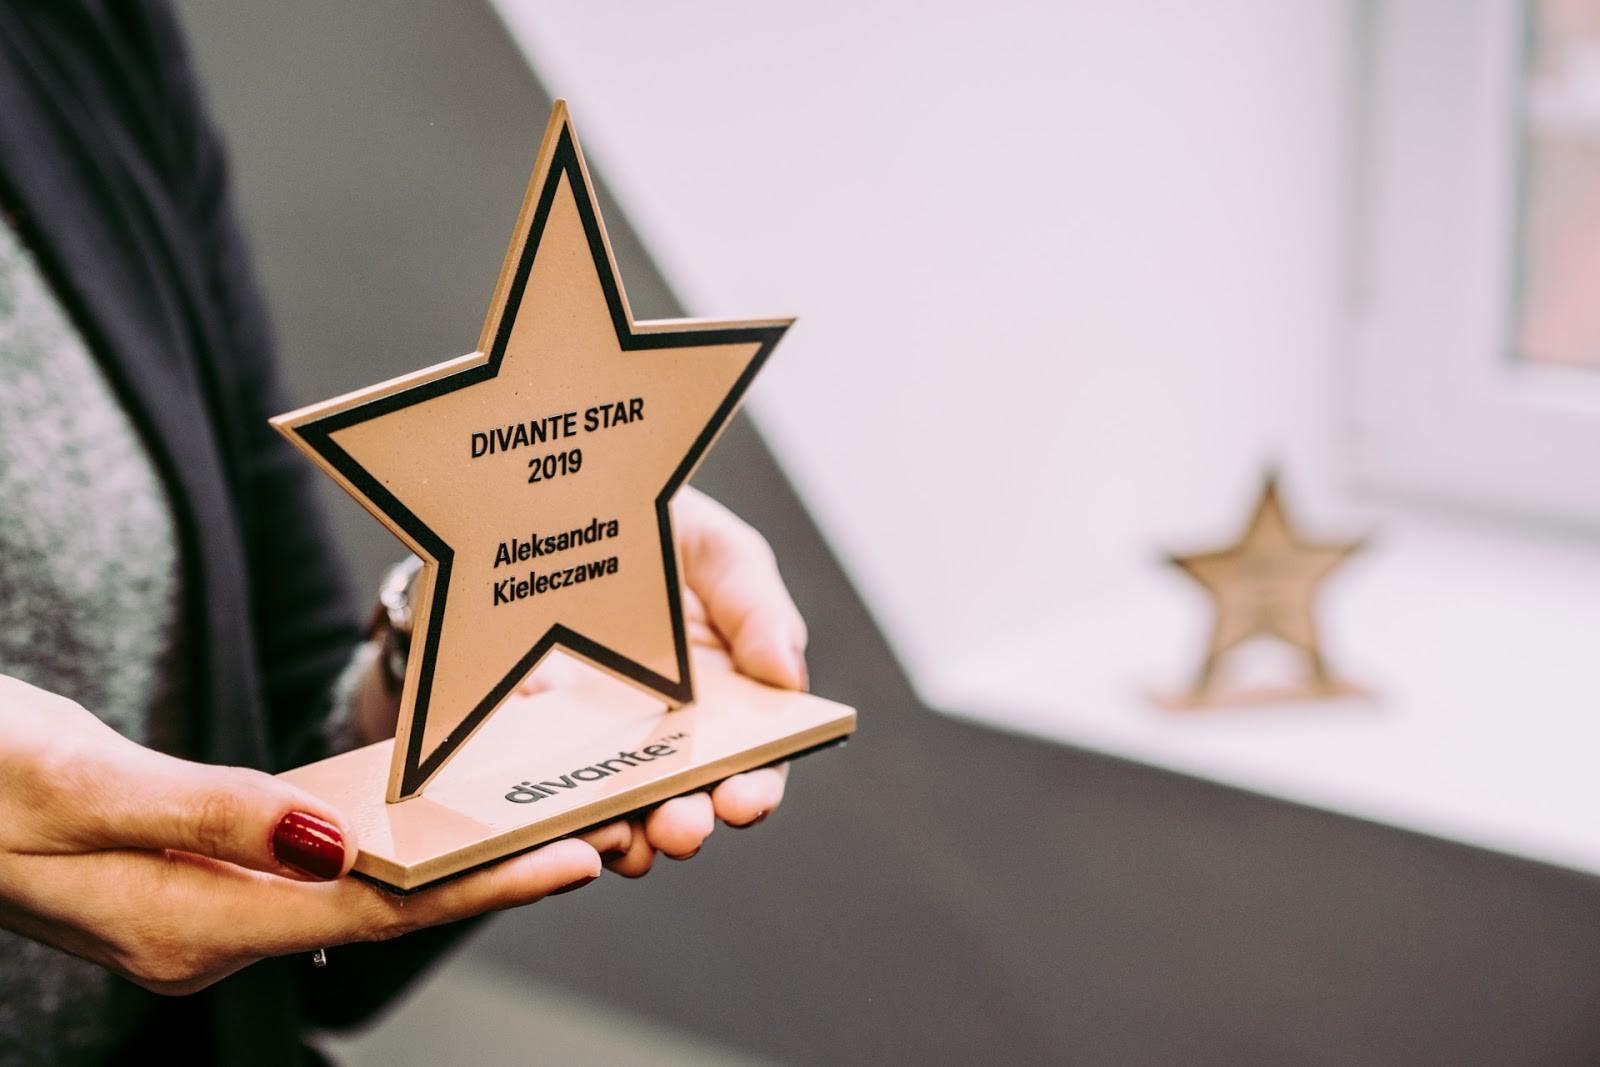 Aleksandra Kieleczawa, Senior HR Specialist at Divante, was awarded with the Divante Stars Award. Photo: KB